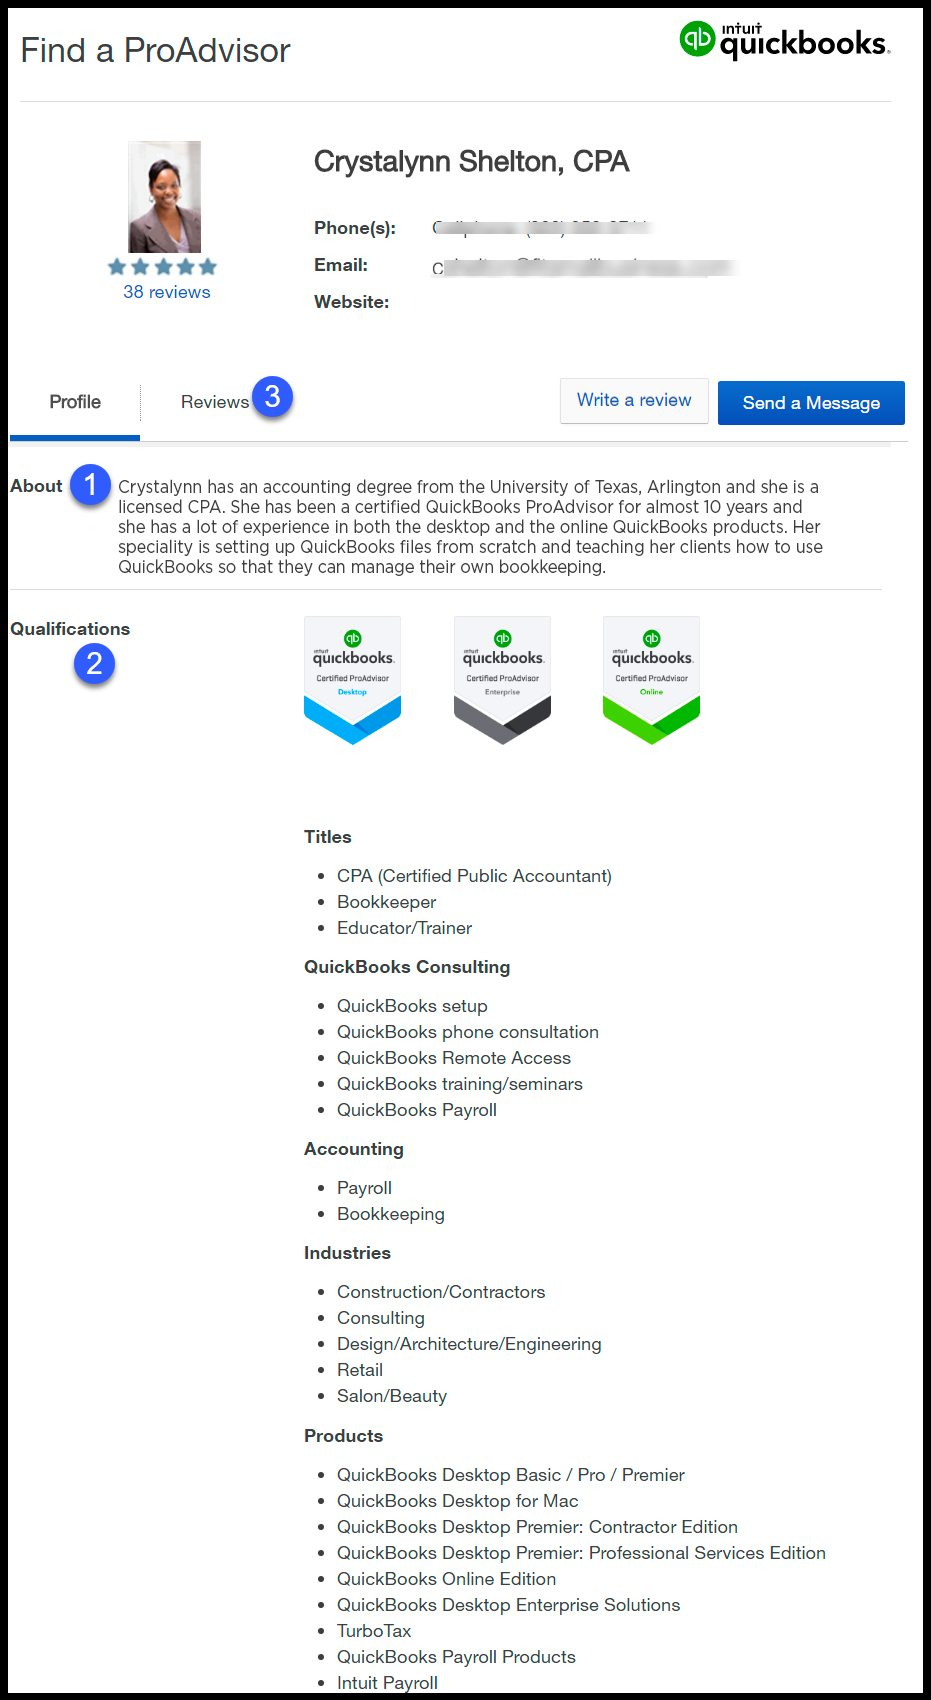 How to find a QuickBooks ProAdvisor Profile